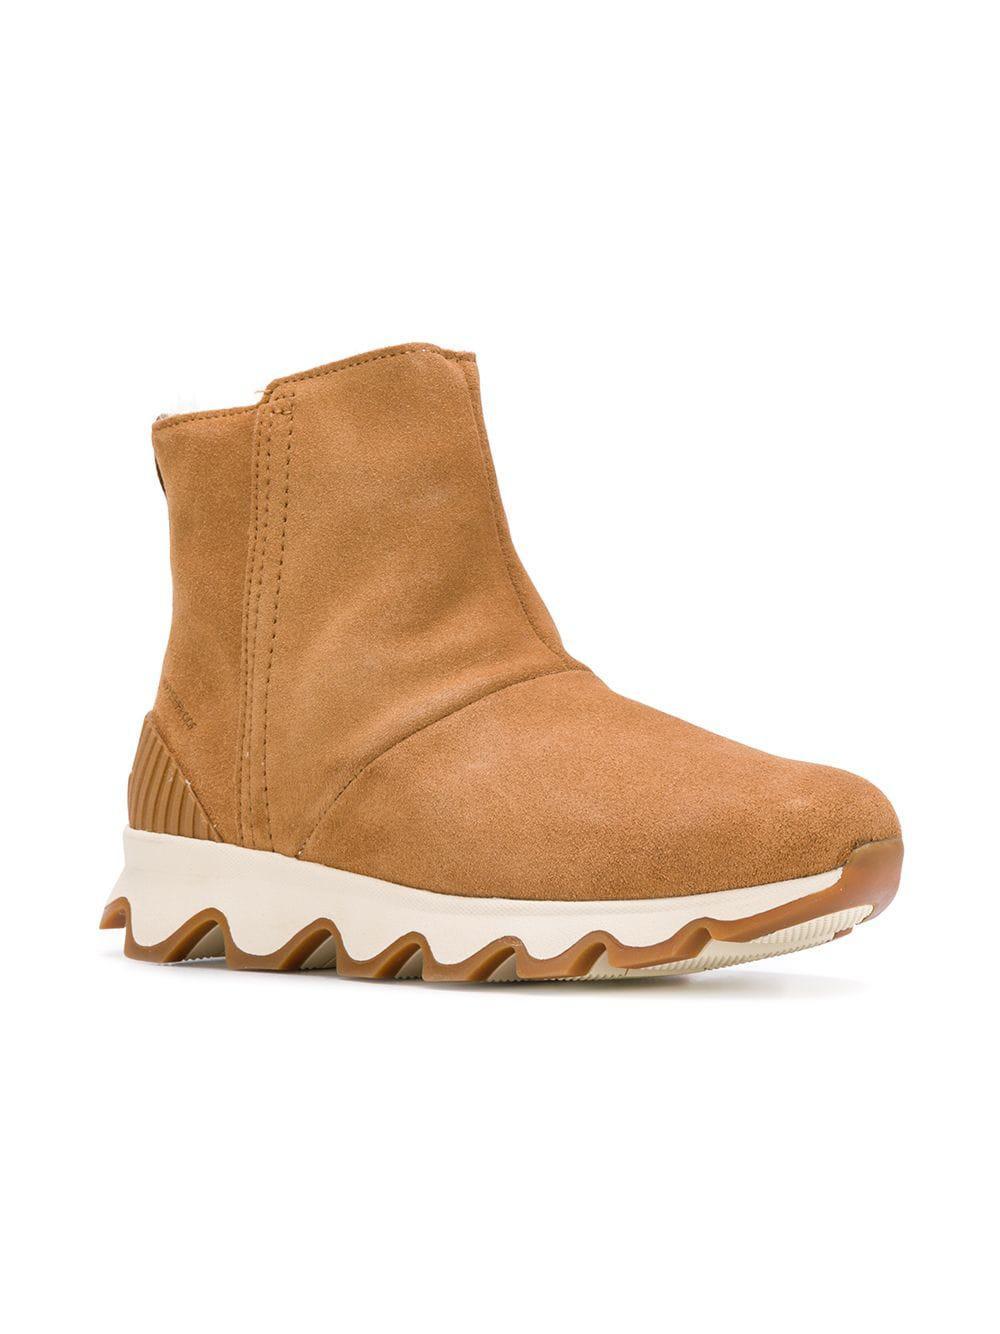 769d01afd89b Sorel - Brown Kinetic Short Boots - Lyst. View fullscreen